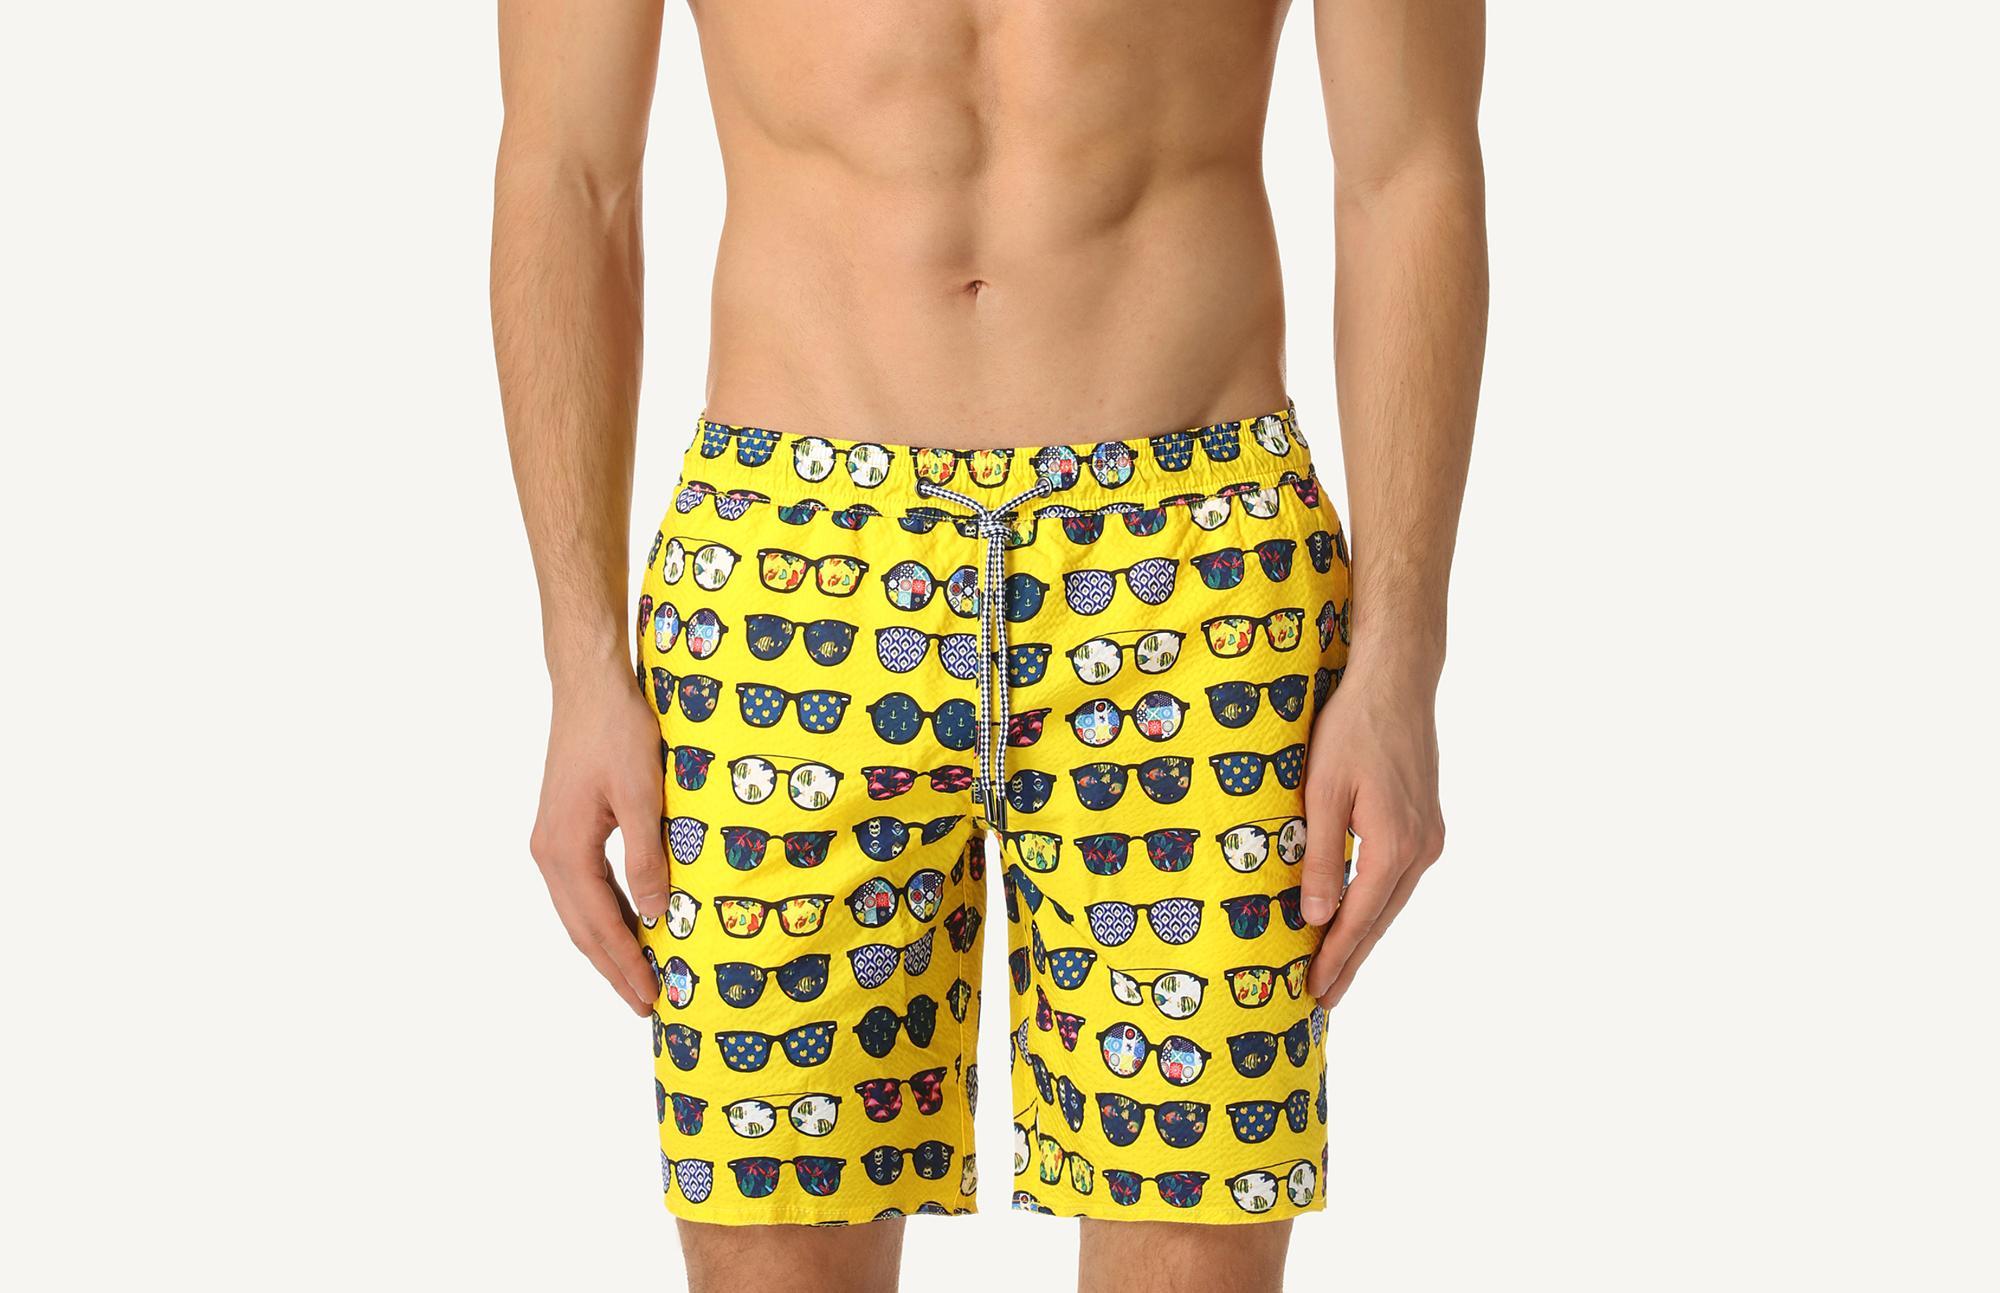 b51bb7ce7b Glasses Print Mid-Length Swim Shorts - Intimissimi